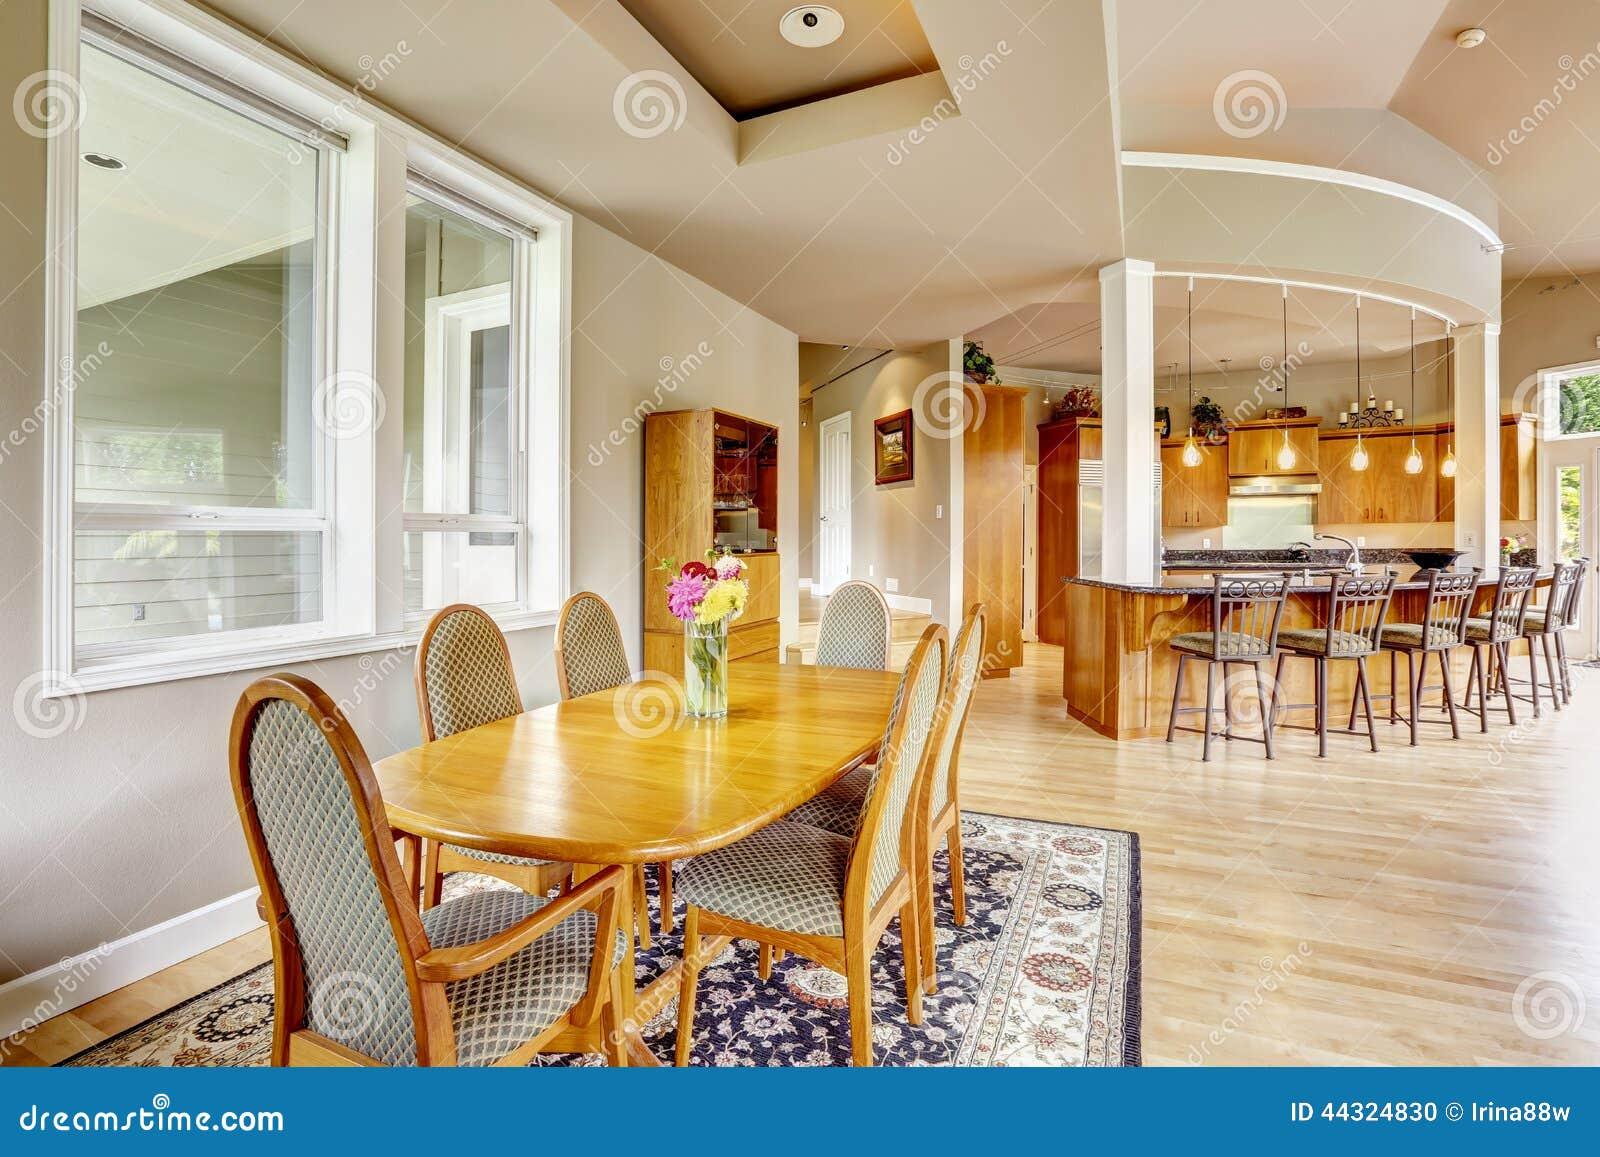 Küche Innen-witn Speiseraum Im Luxushaus Immobilien I Stockfoto ... size: 1300 x 957 post ID: 9 File size: 0 B